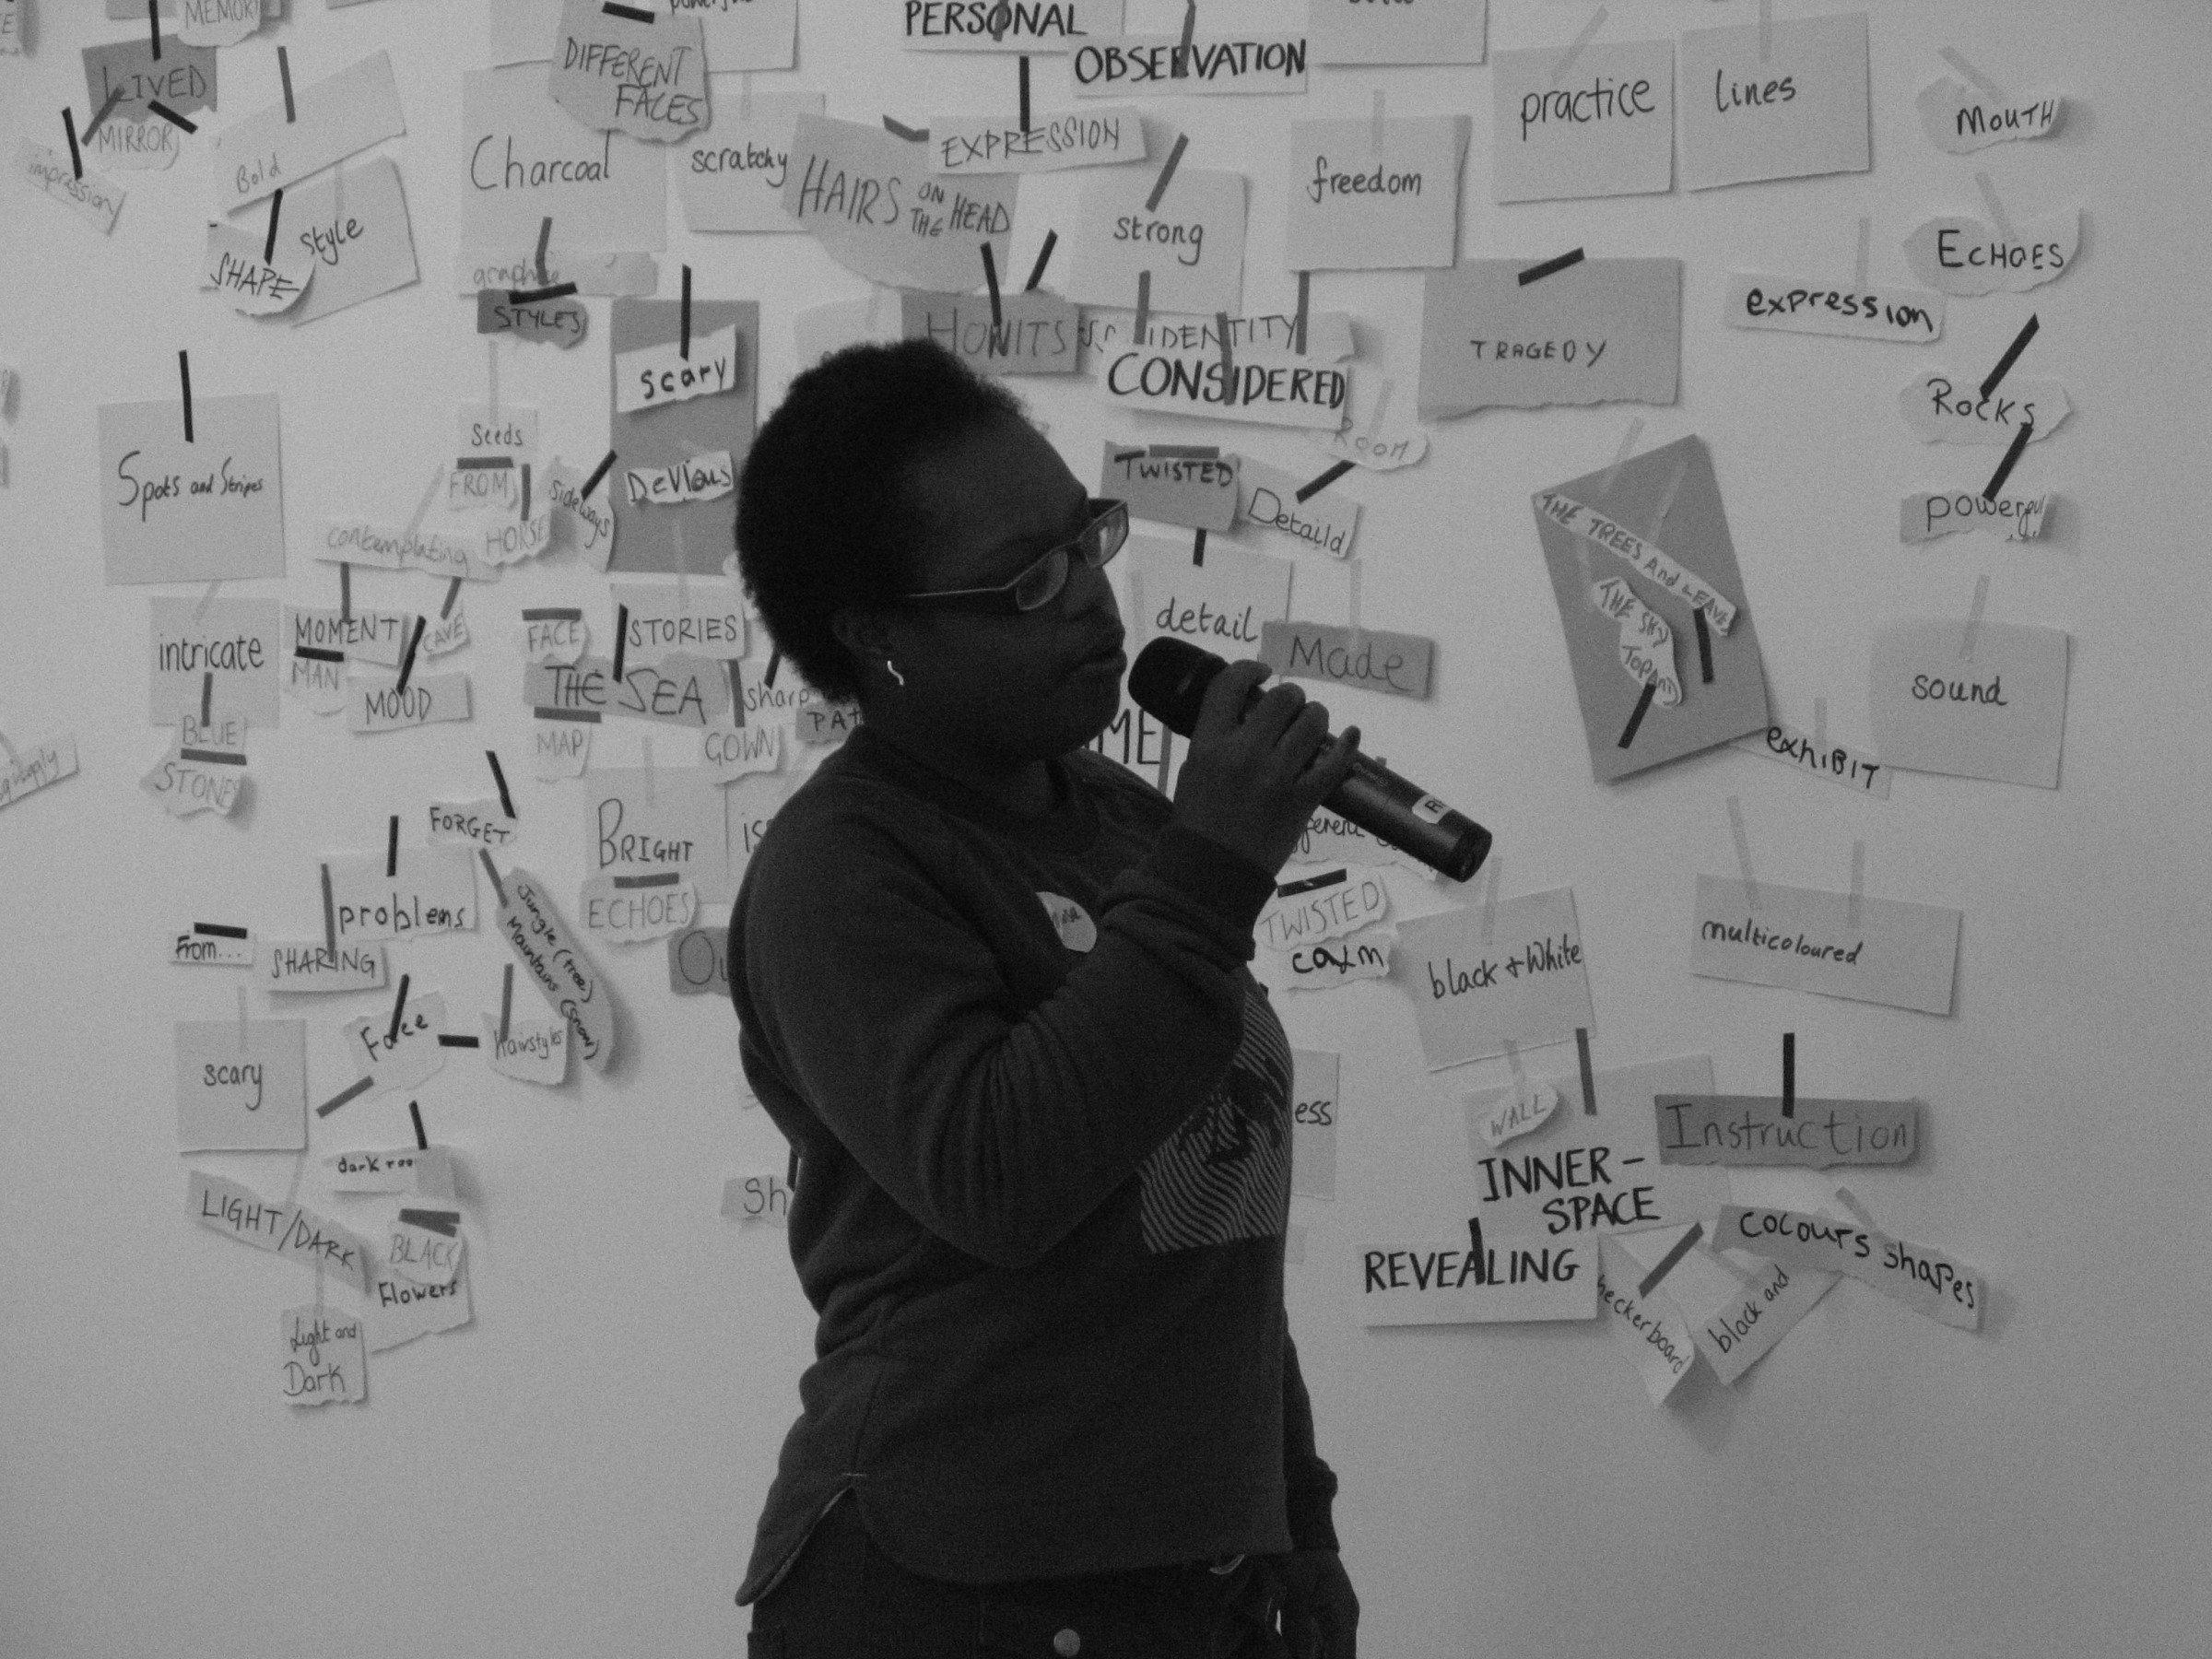 Ntiense Eno Amooquaye, See Revolutionary Art Exhibit performance